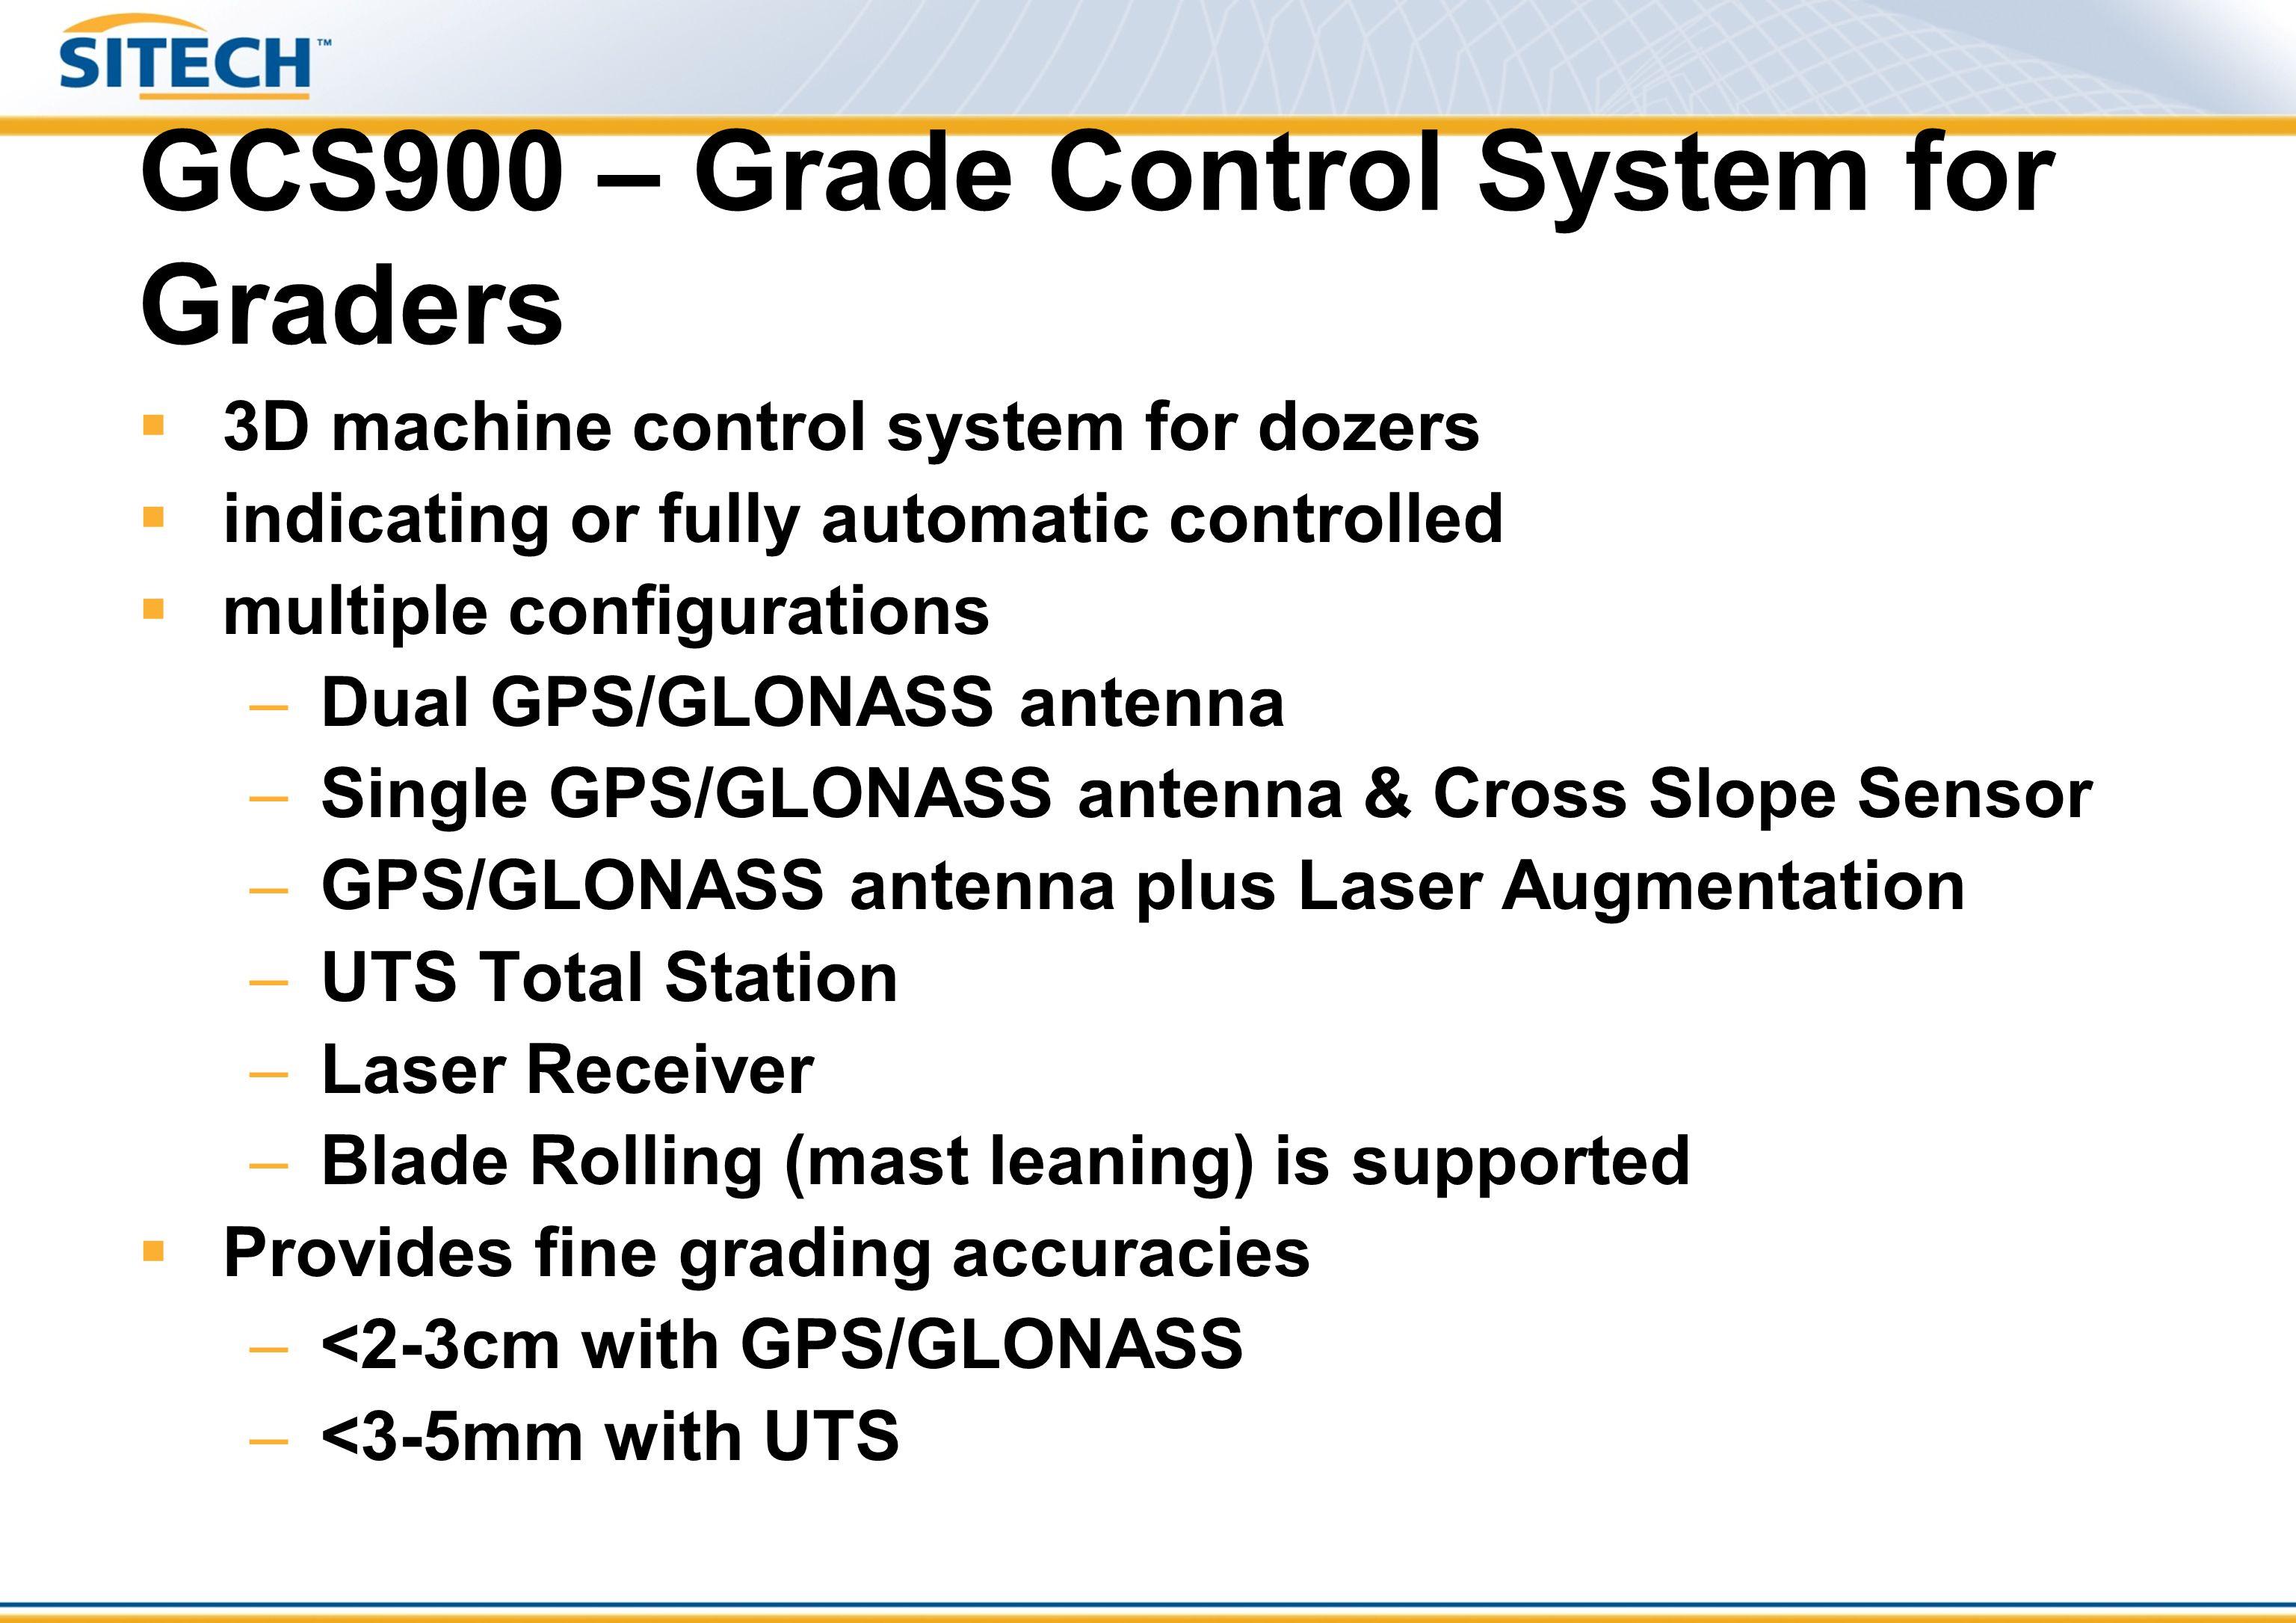 Trimble GCS900: 3D Grader – UTS & Cross-slope Harness MT900SNRST400 (opt) Power Module PM400 Valve Module VM4X0 Mainfall Sensor AS400 Crossfall Sensor AS400 Rotation Sensor RS400 Mainfall Sensor AS400 (optional for blade rolling) CB430 LB400 SNM930 or